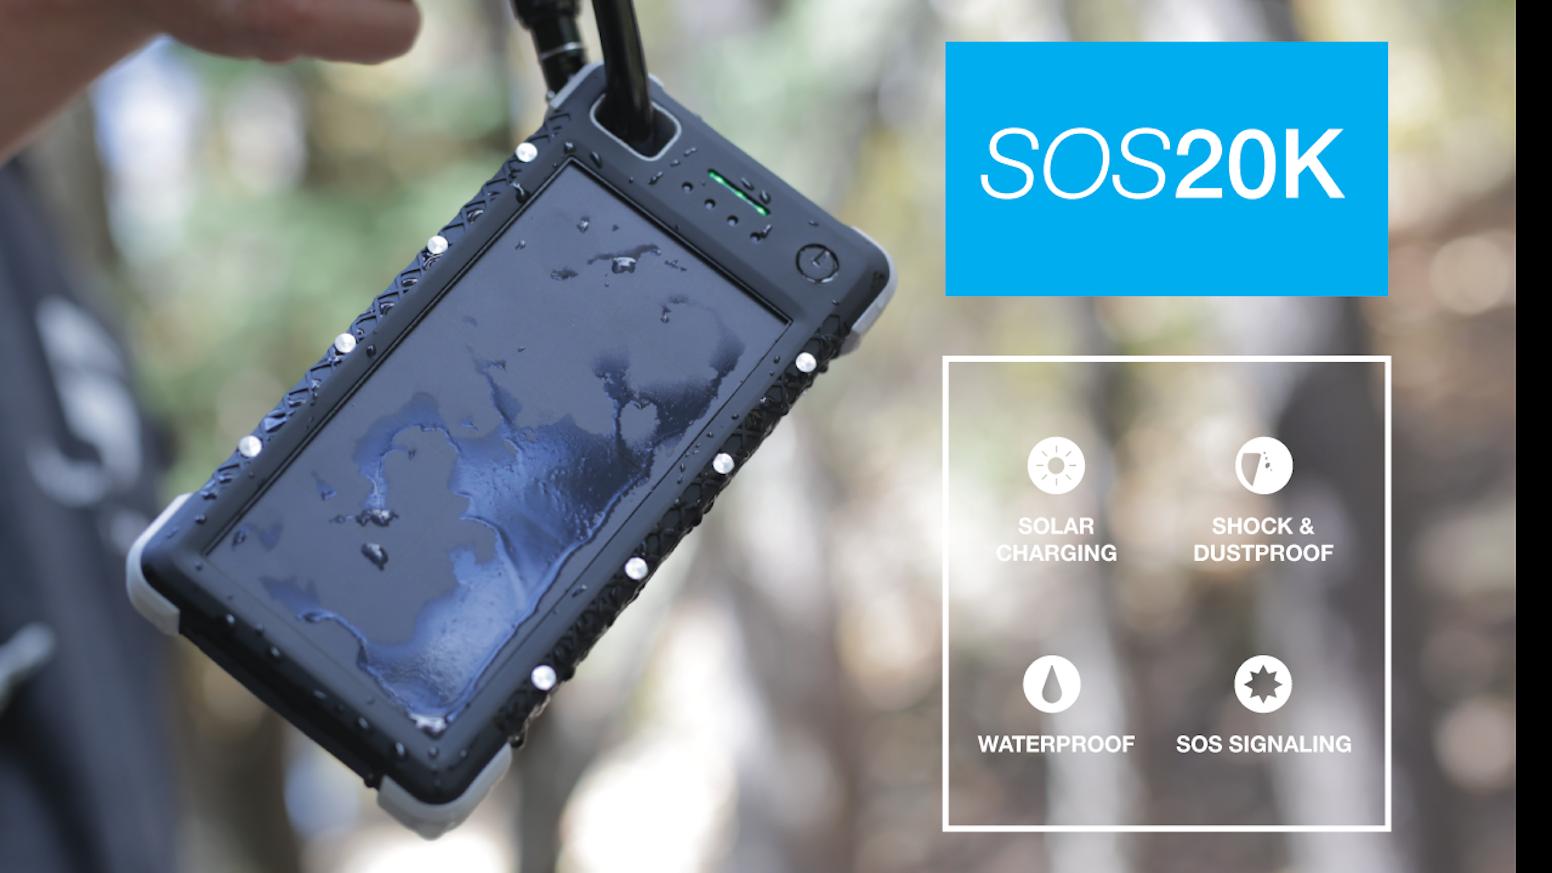 sos 20k life saving portable solar battery by sos powerbank